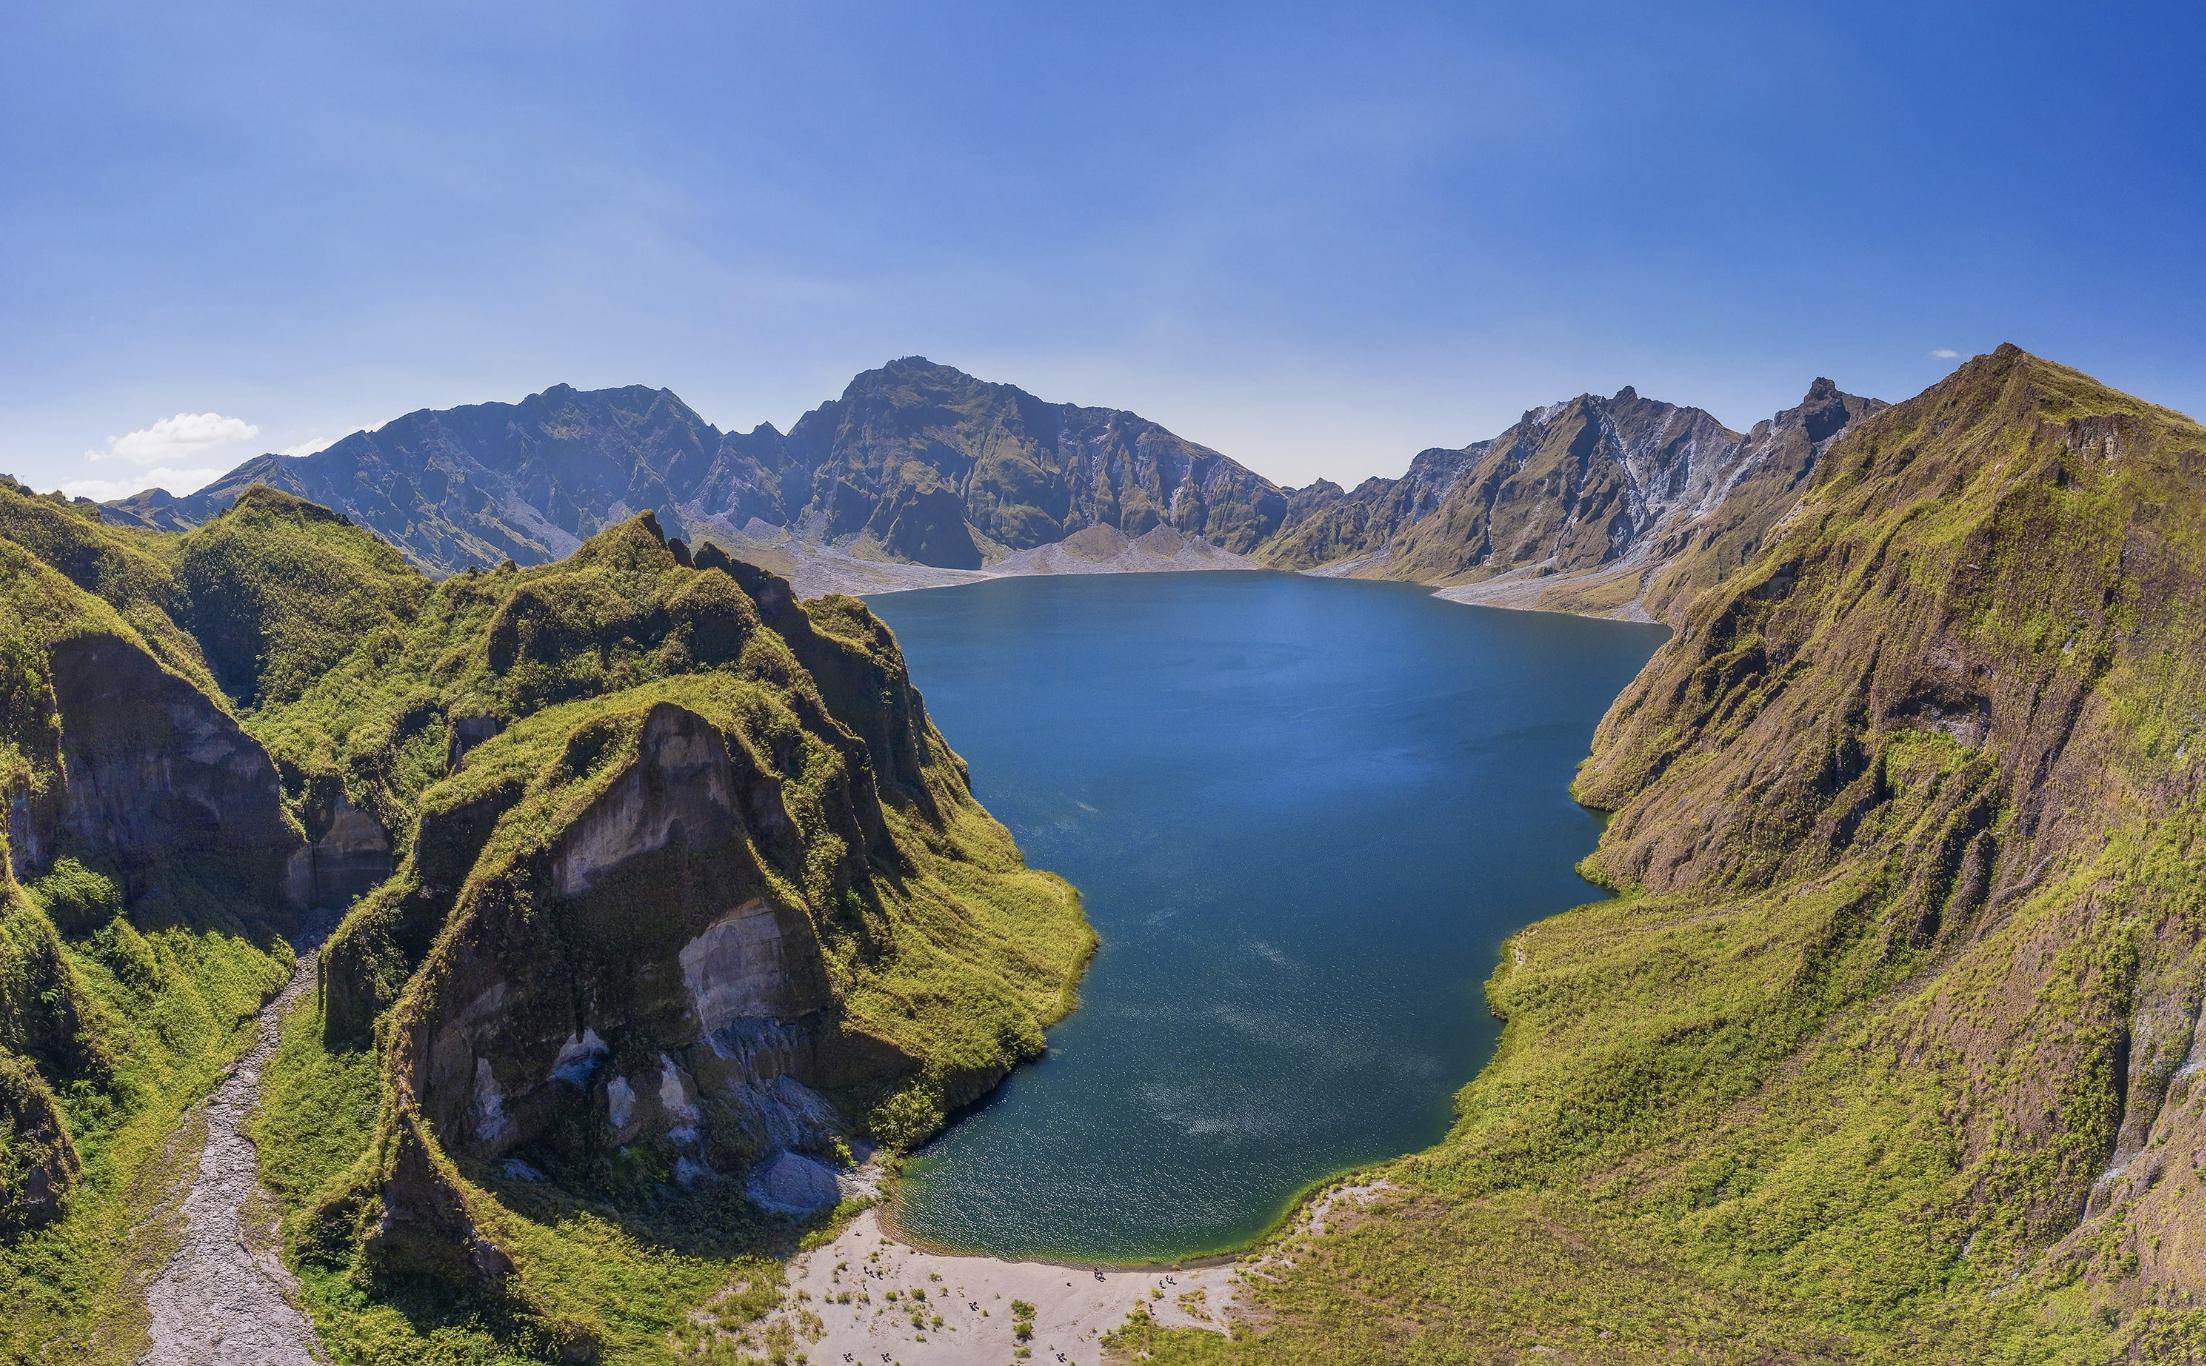 Mt. Pinatubo Crater Lake view